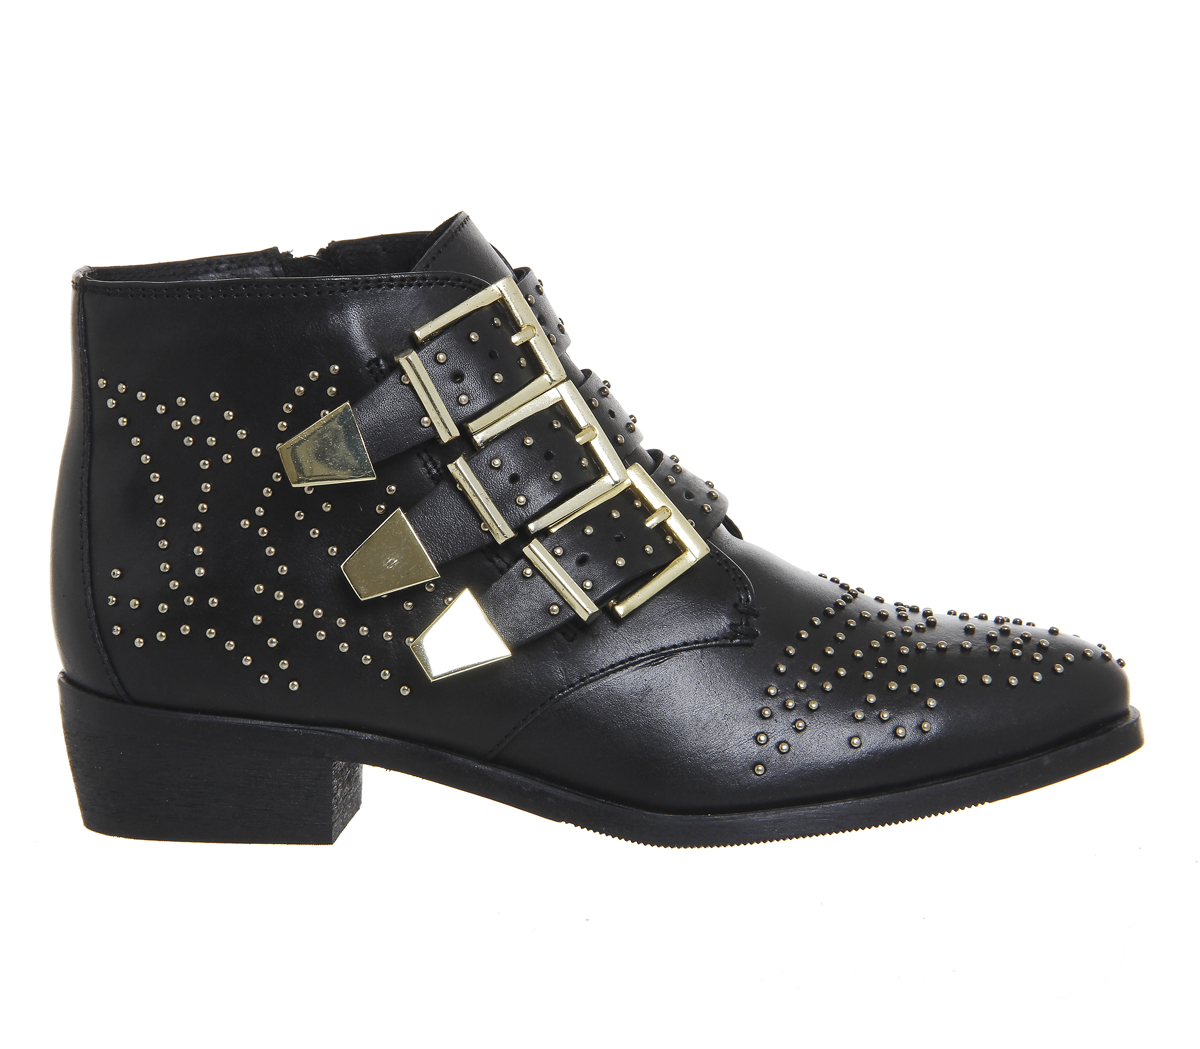 OFFICE     Lucky Charm  Studded Boots – Black   Gold – Never ... f921cfdd4e1